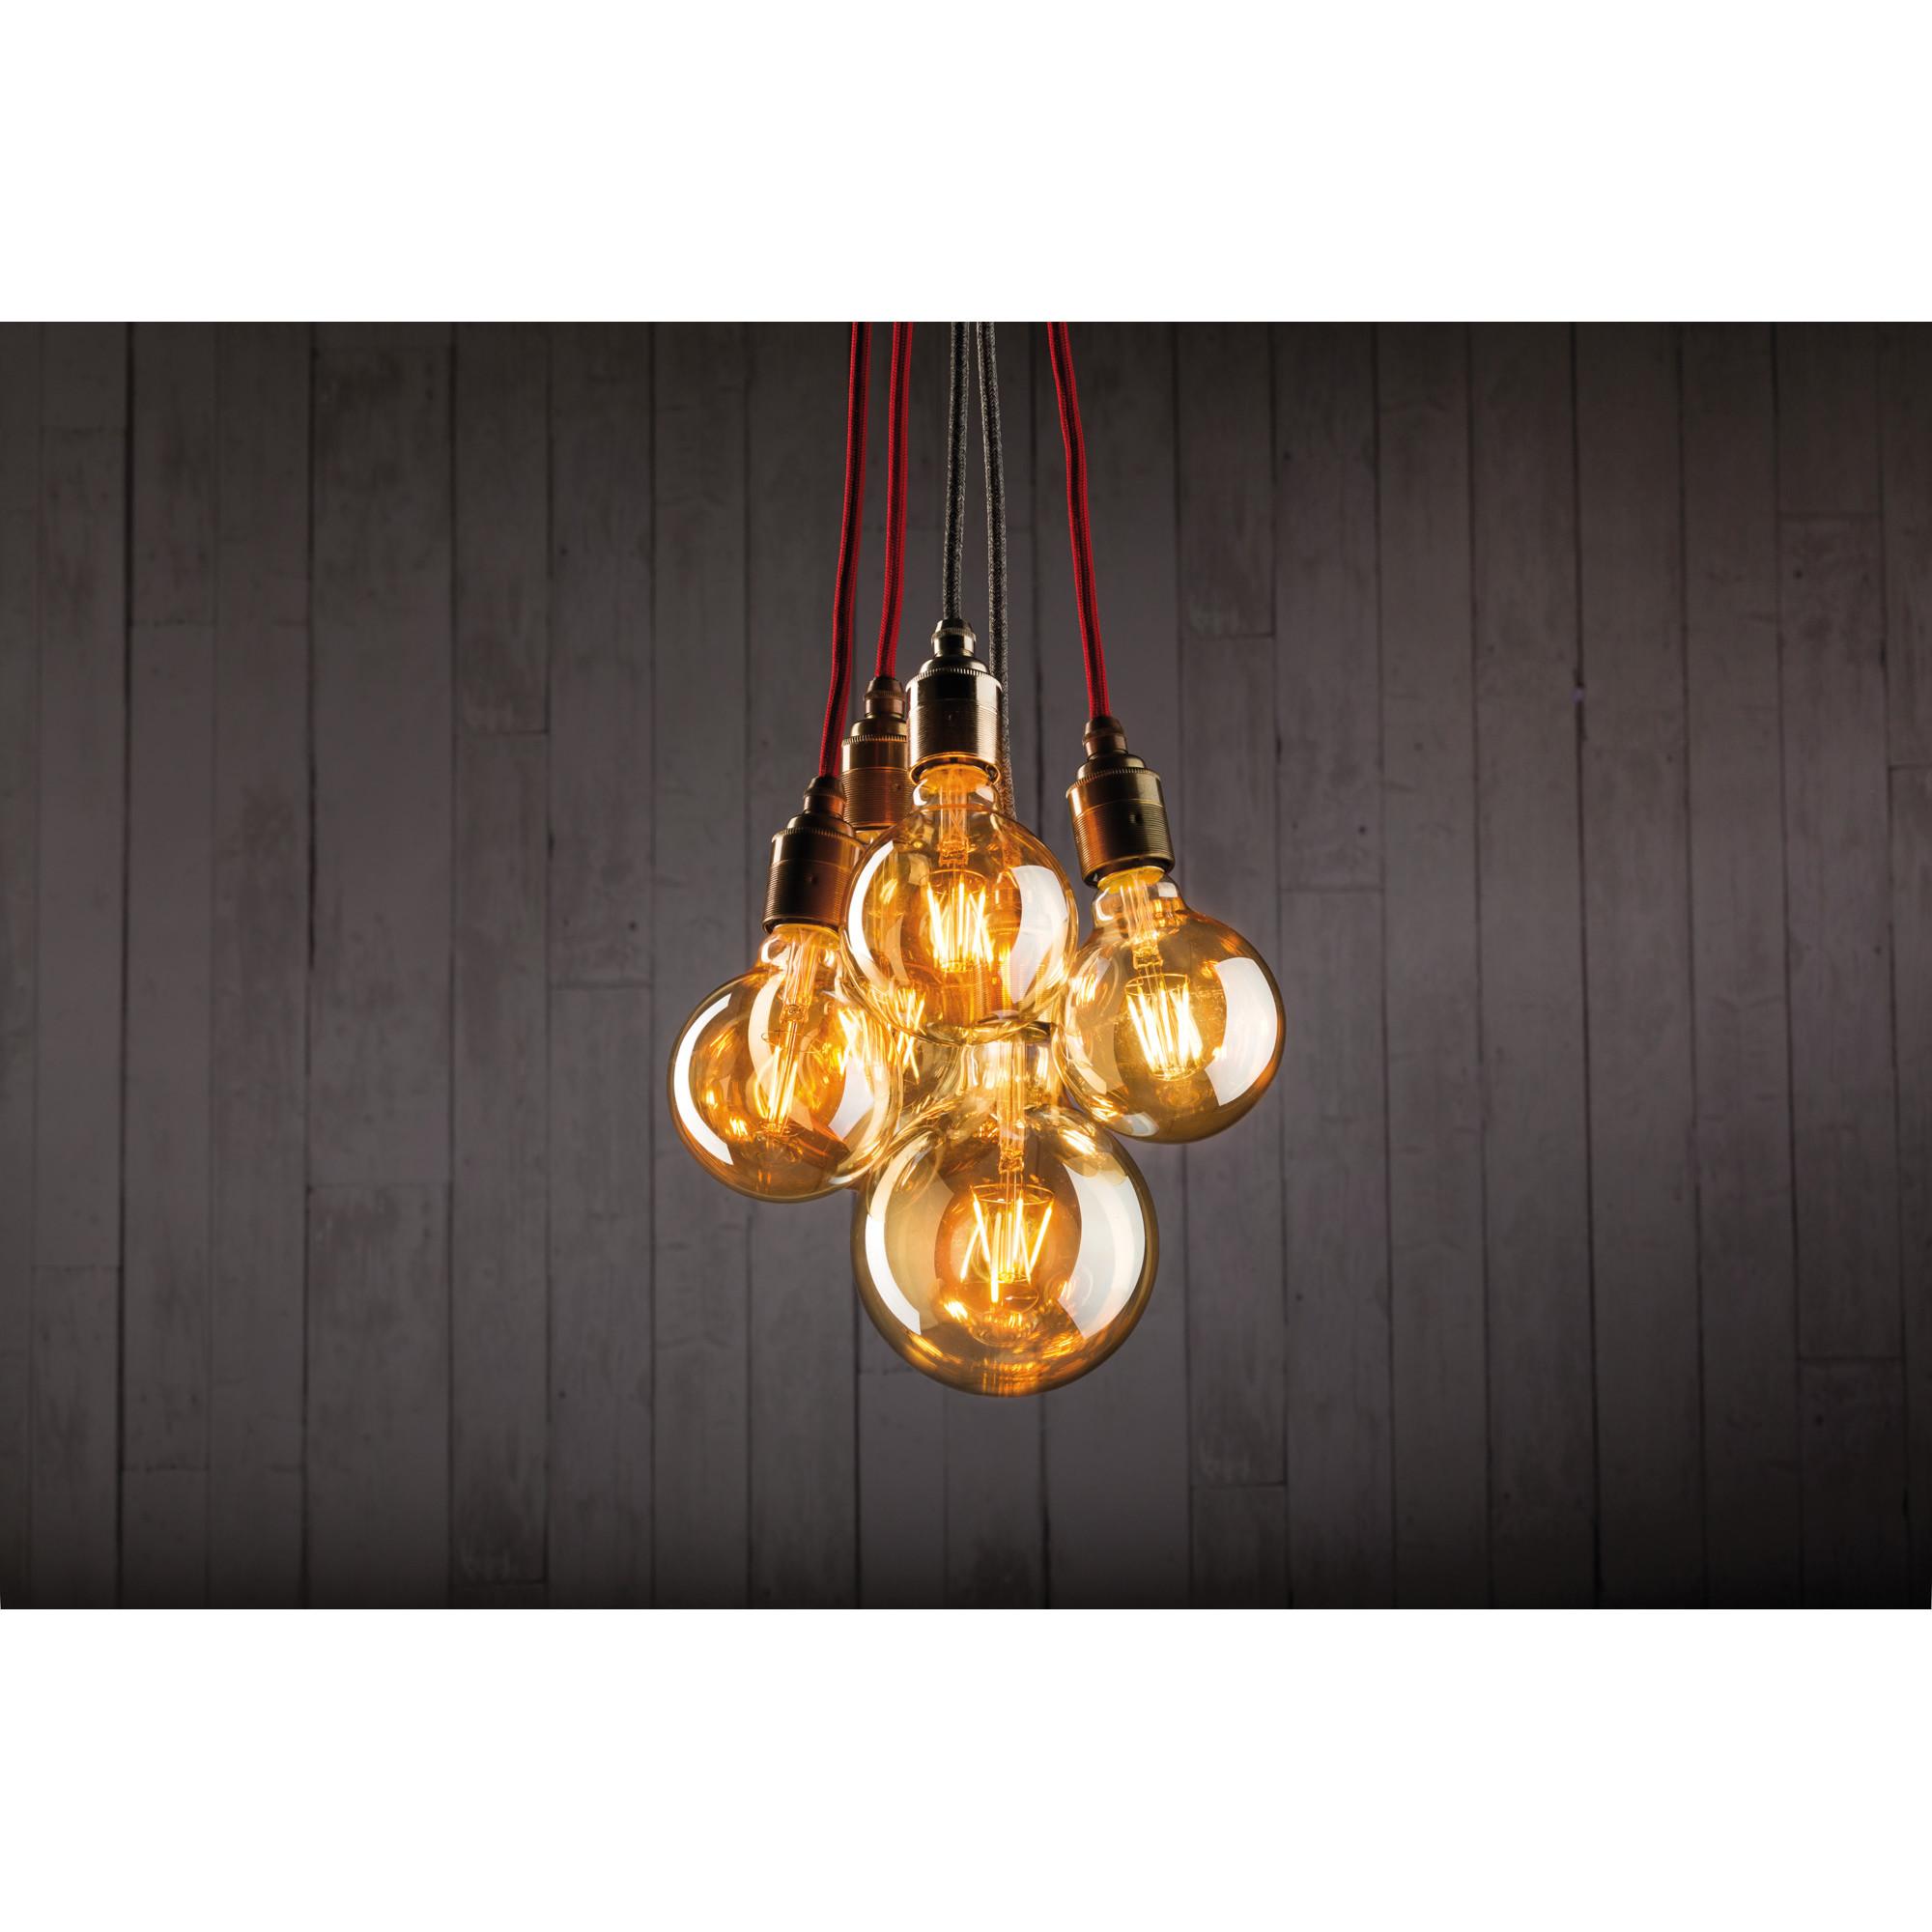 Лампа филаментная Paulmann Шар G125 6.5Вт 420лм 1700К Е27 230В Золото 28381.